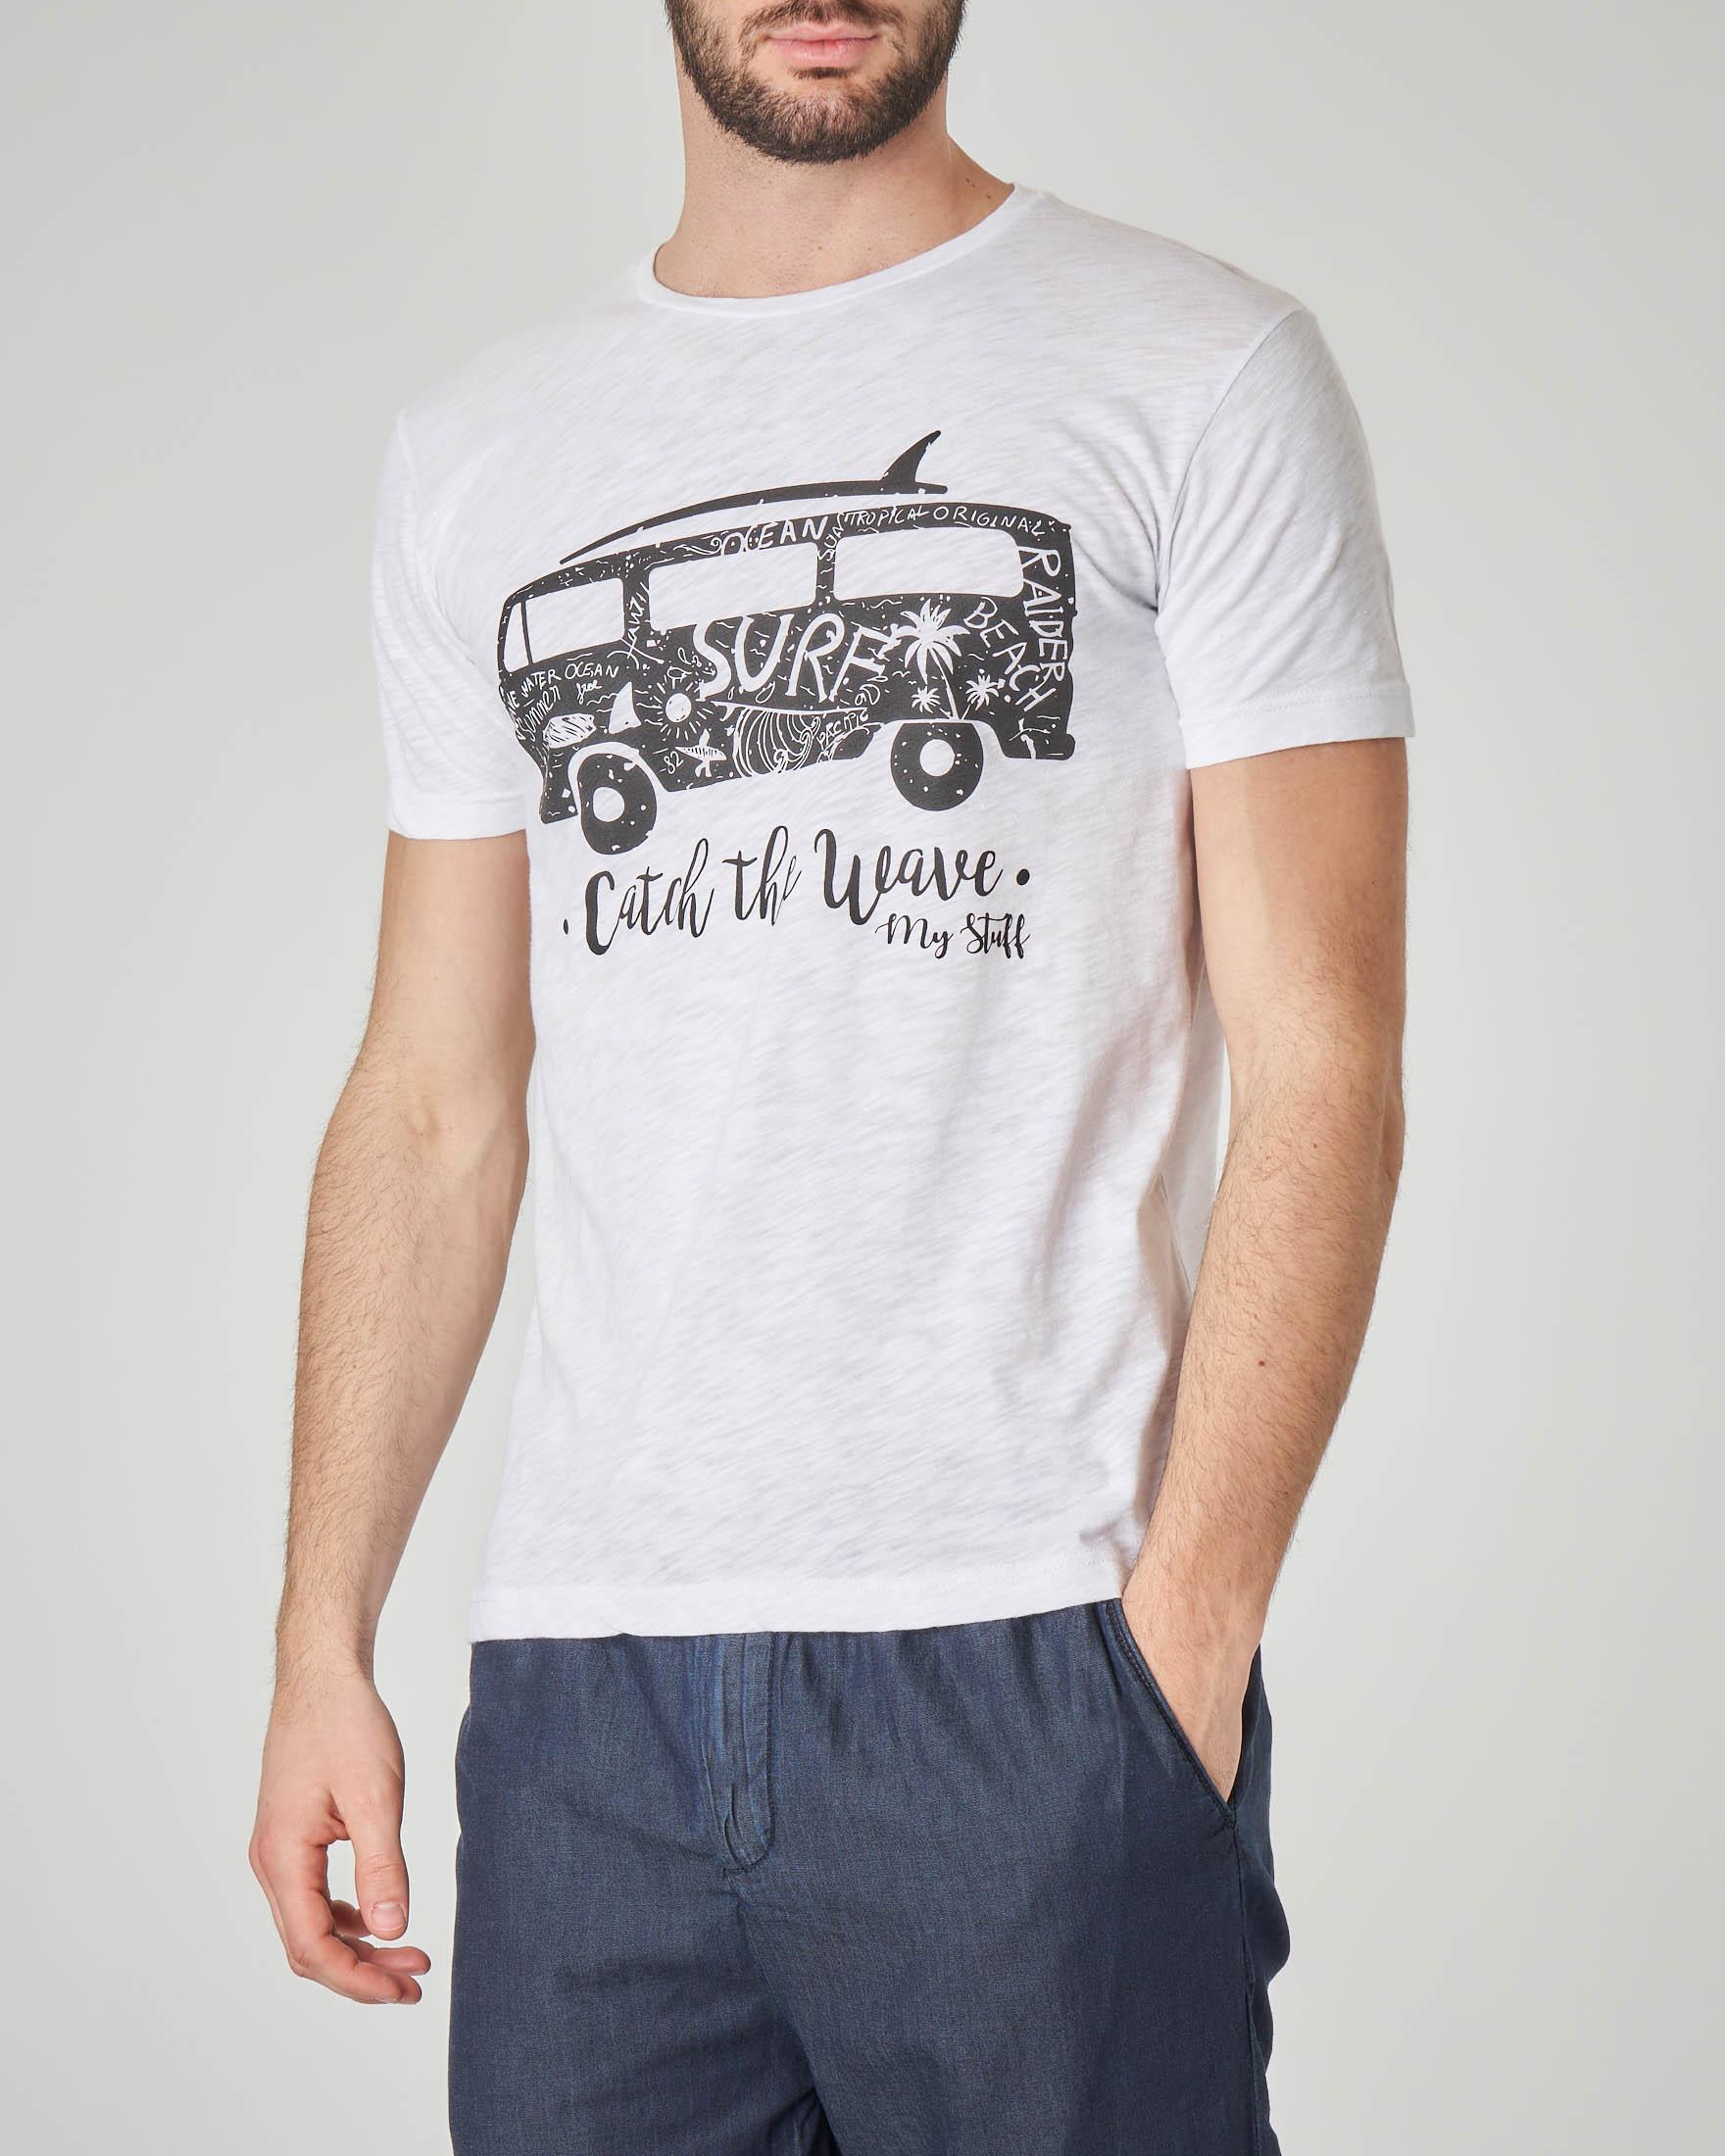 T-shirt bianca con stampa furgoncino hippie